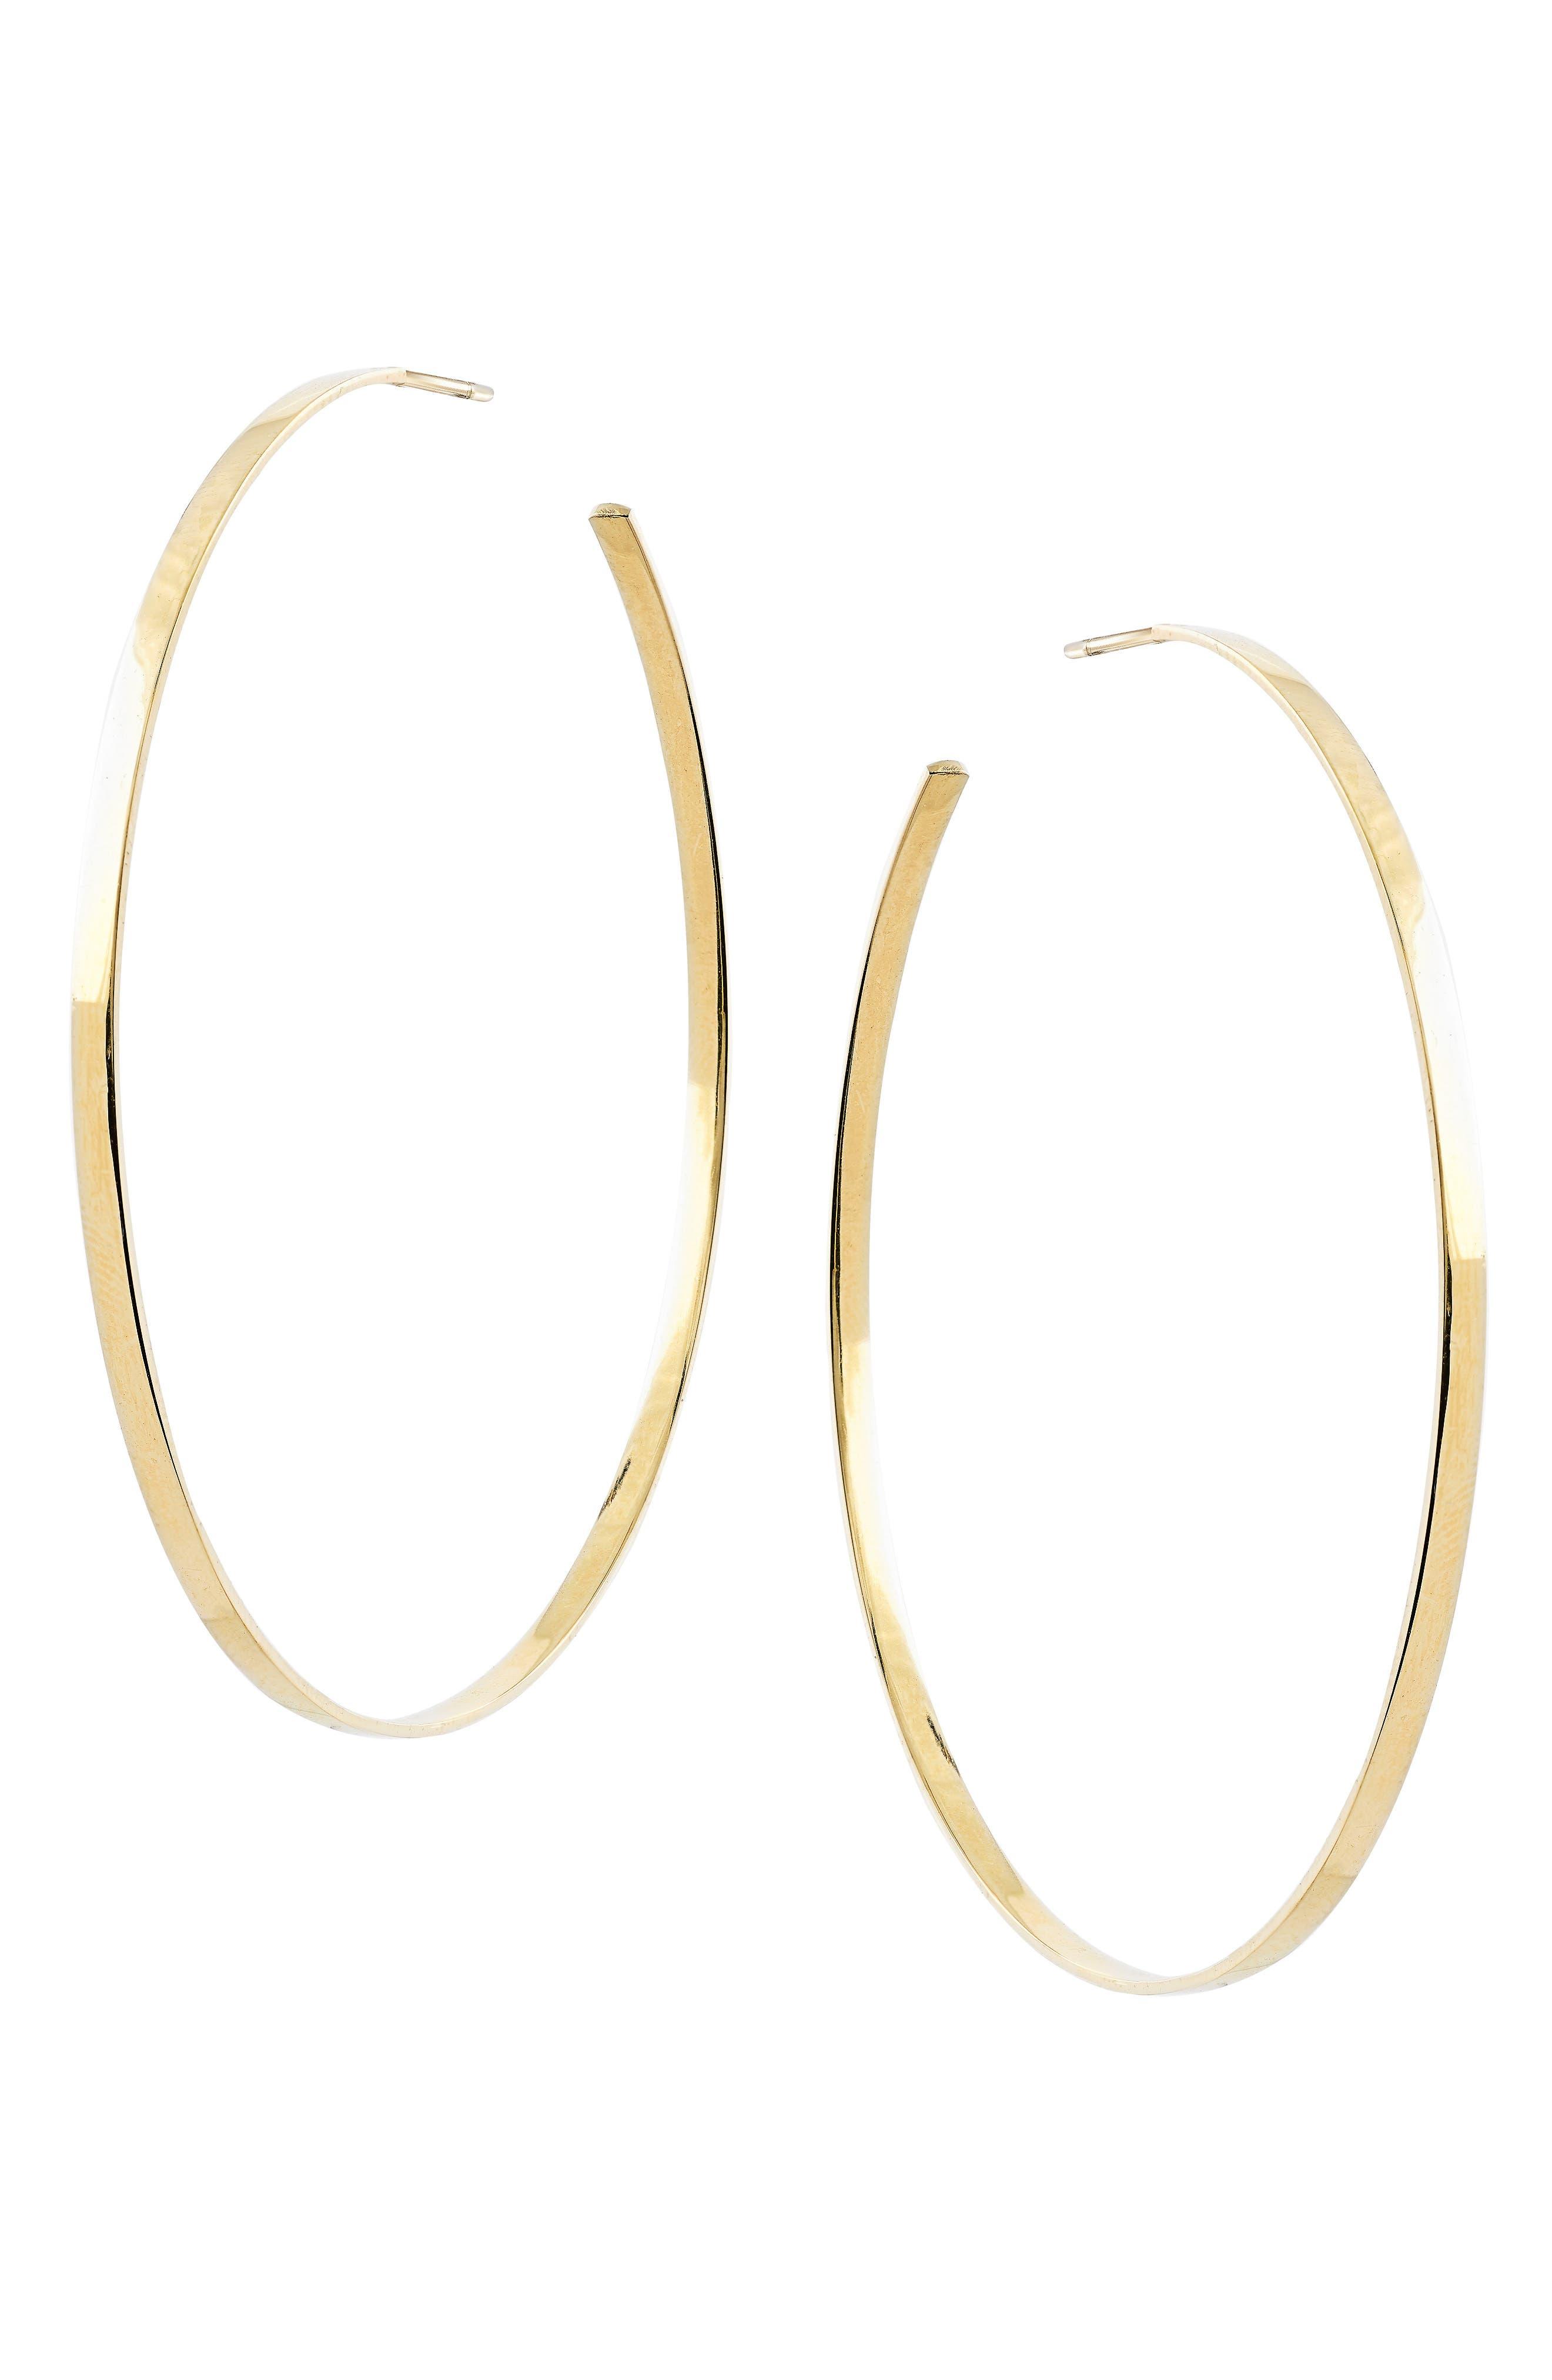 Sunrise Hoop Earrings,                         Main,                         color, YELLOW GOLD